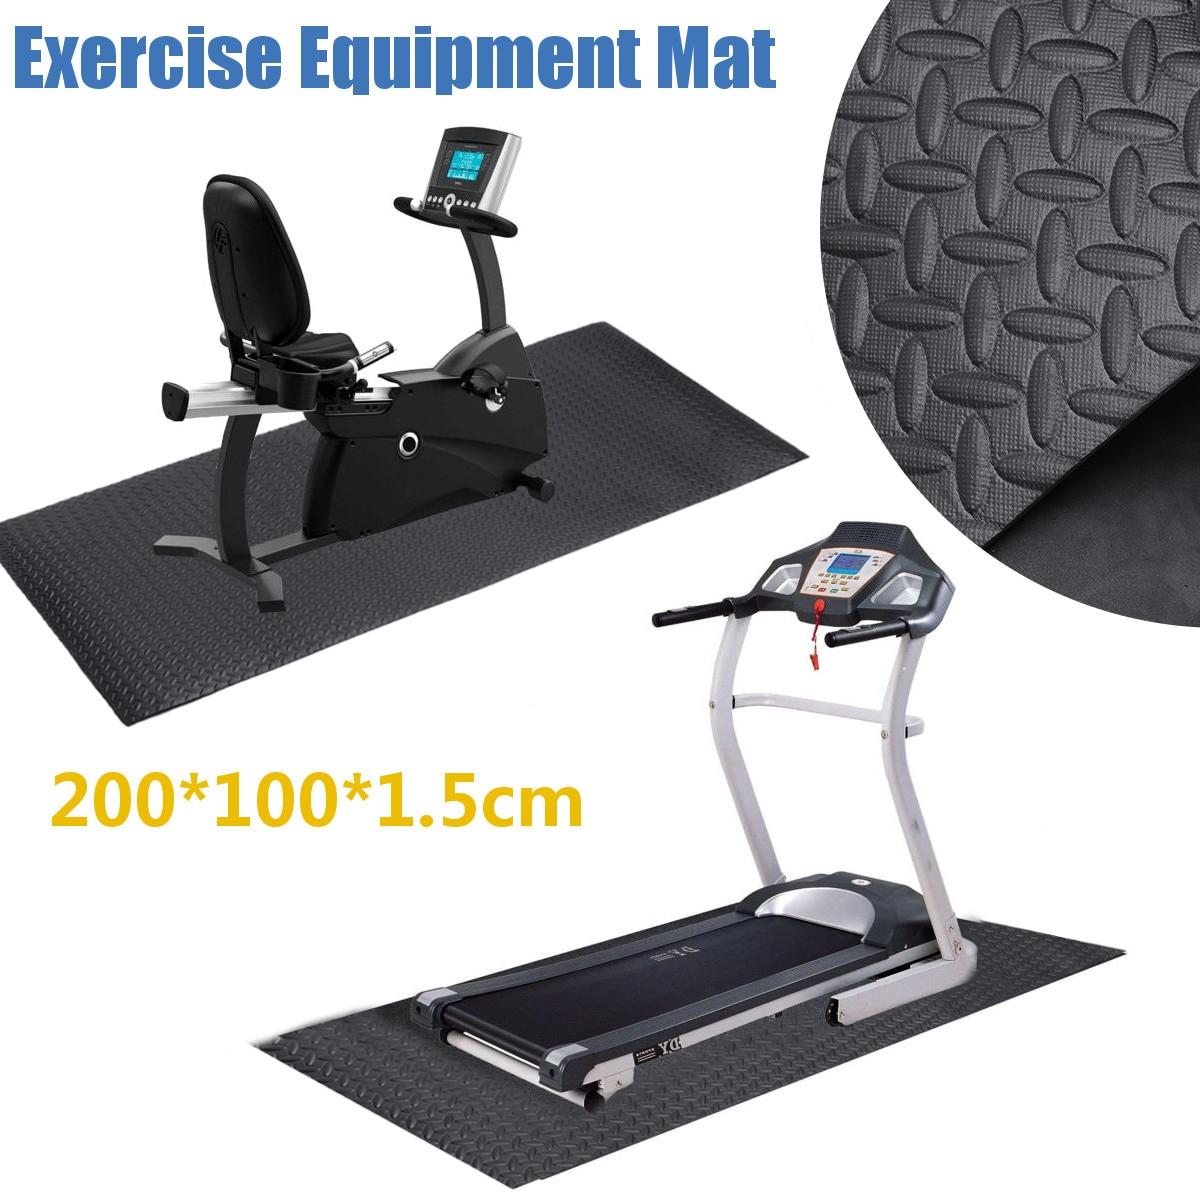 Treadmill Mat 6PCs Non-Slip Heavy Duty Equipment Mat Cushion Waterproof Sound Insulation Shock Absorbing Treadmill Mat for Hardwood Floors